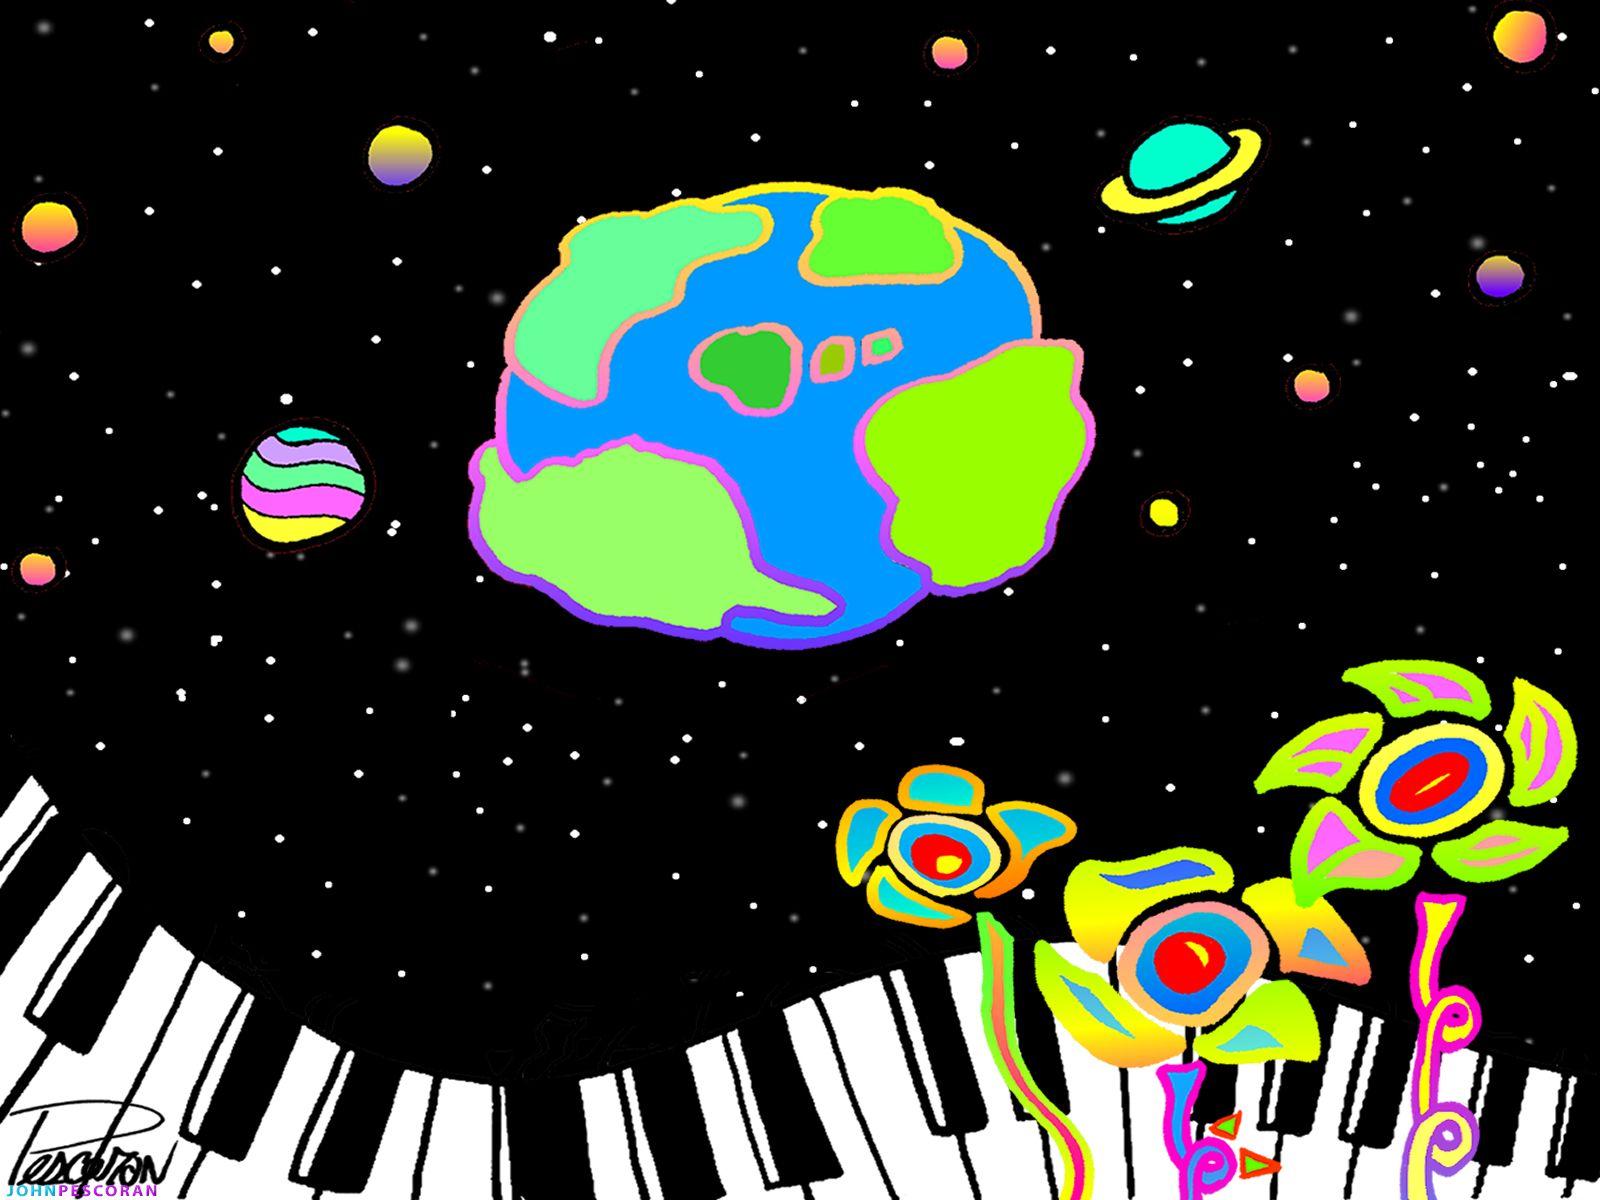 John pescoran pescoran pop art wallpaper - Wallpaper artist music ...